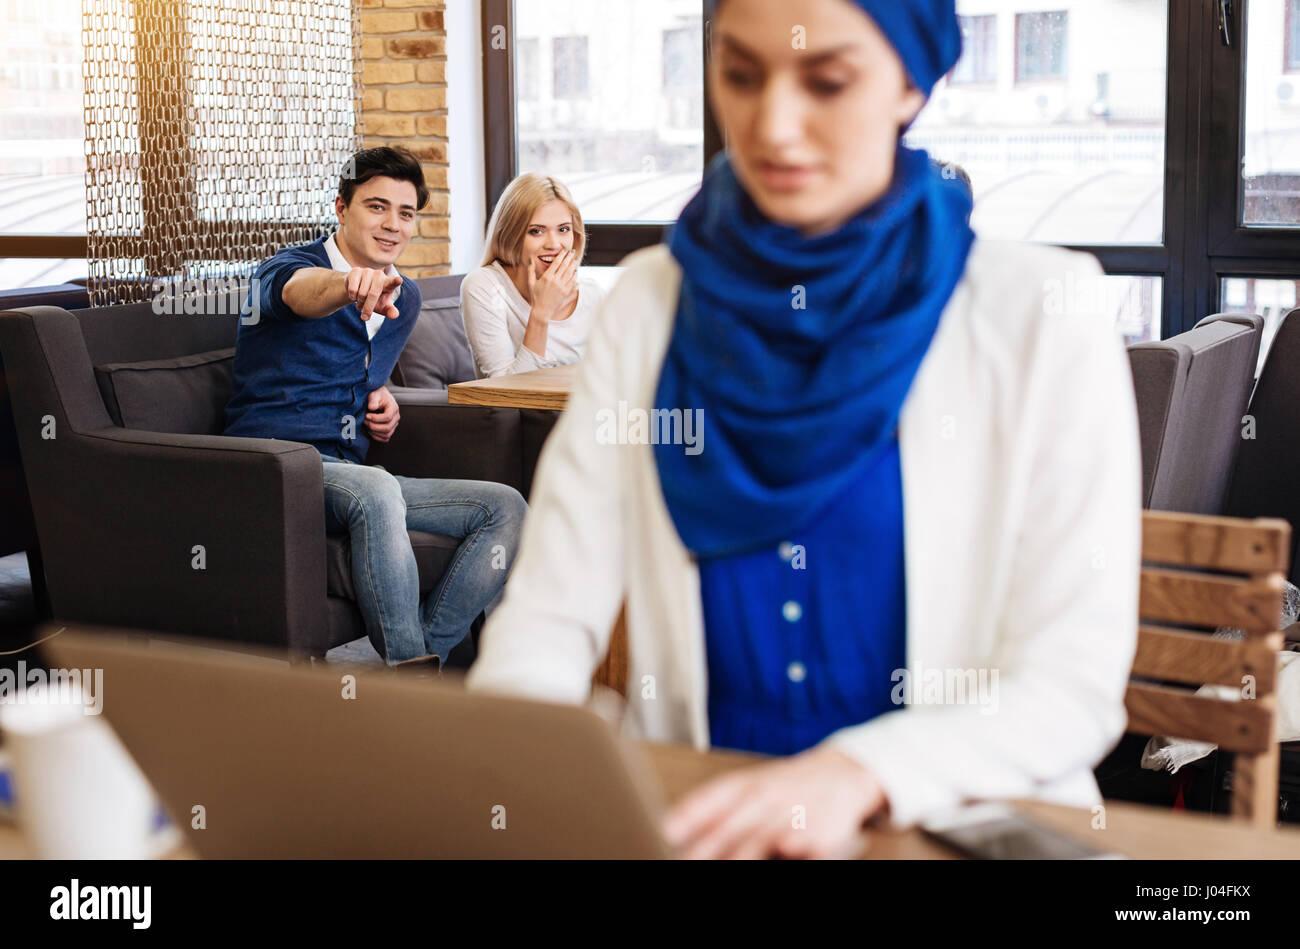 Joyful students humiliating muslim woman - Stock Image